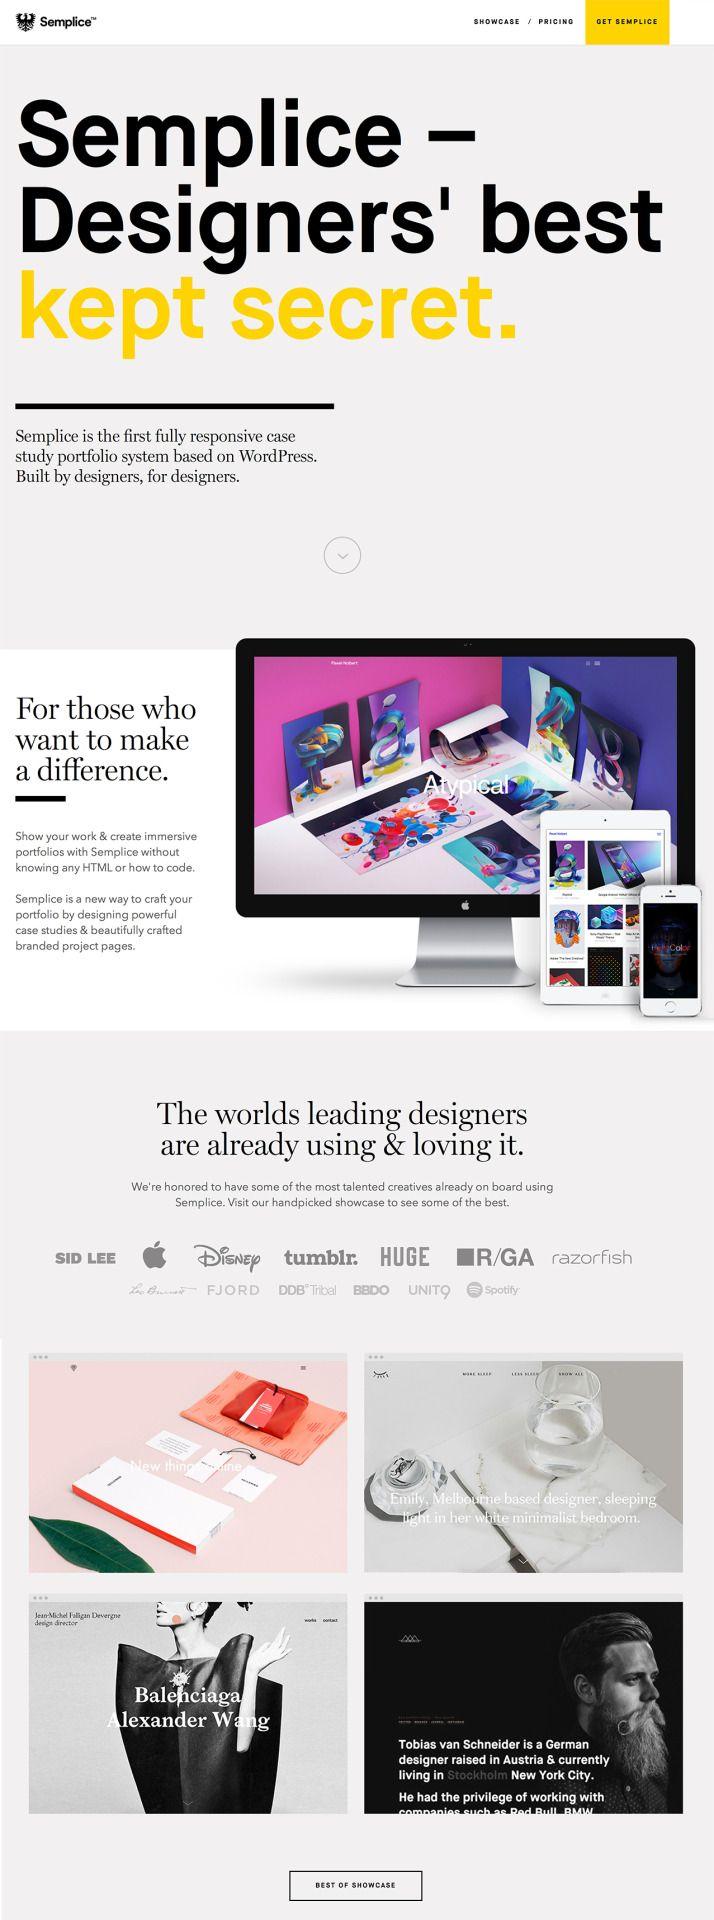 Semplice - Designers' best kept secret  http://www.semplicelabs.com/